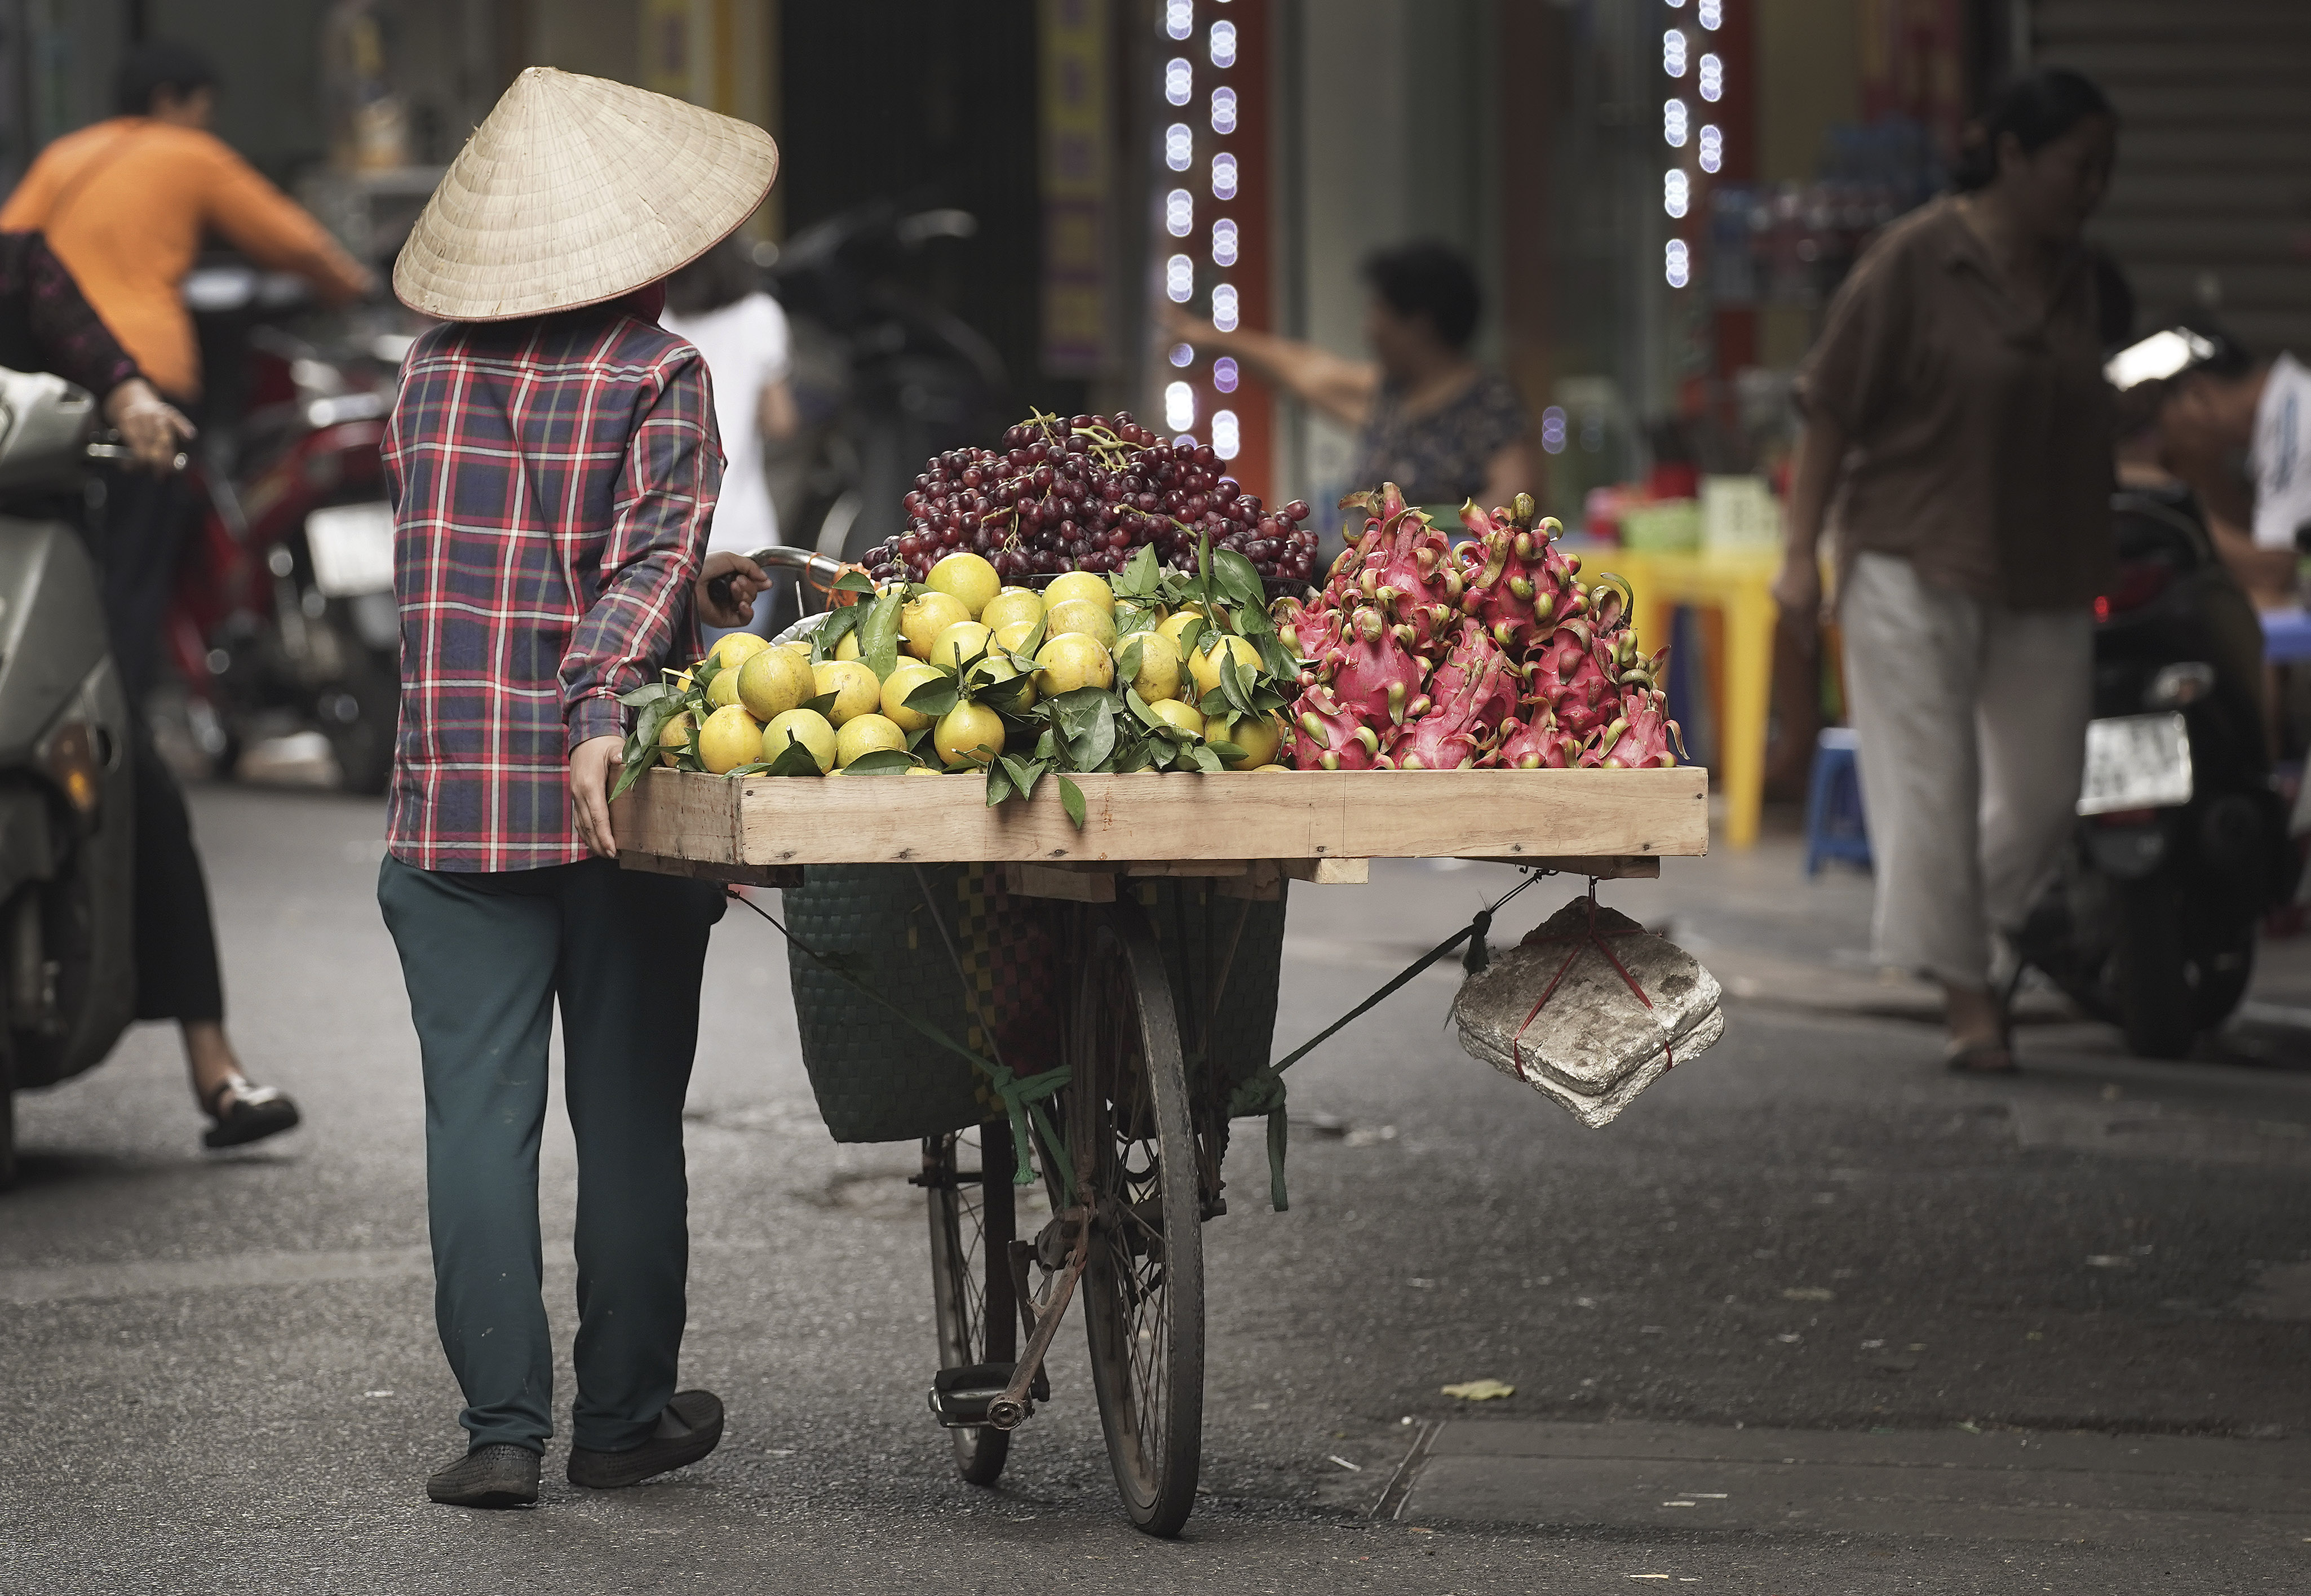 A woman sells produce in Hanoi, Vietnam, on Nov. 17, 2019.